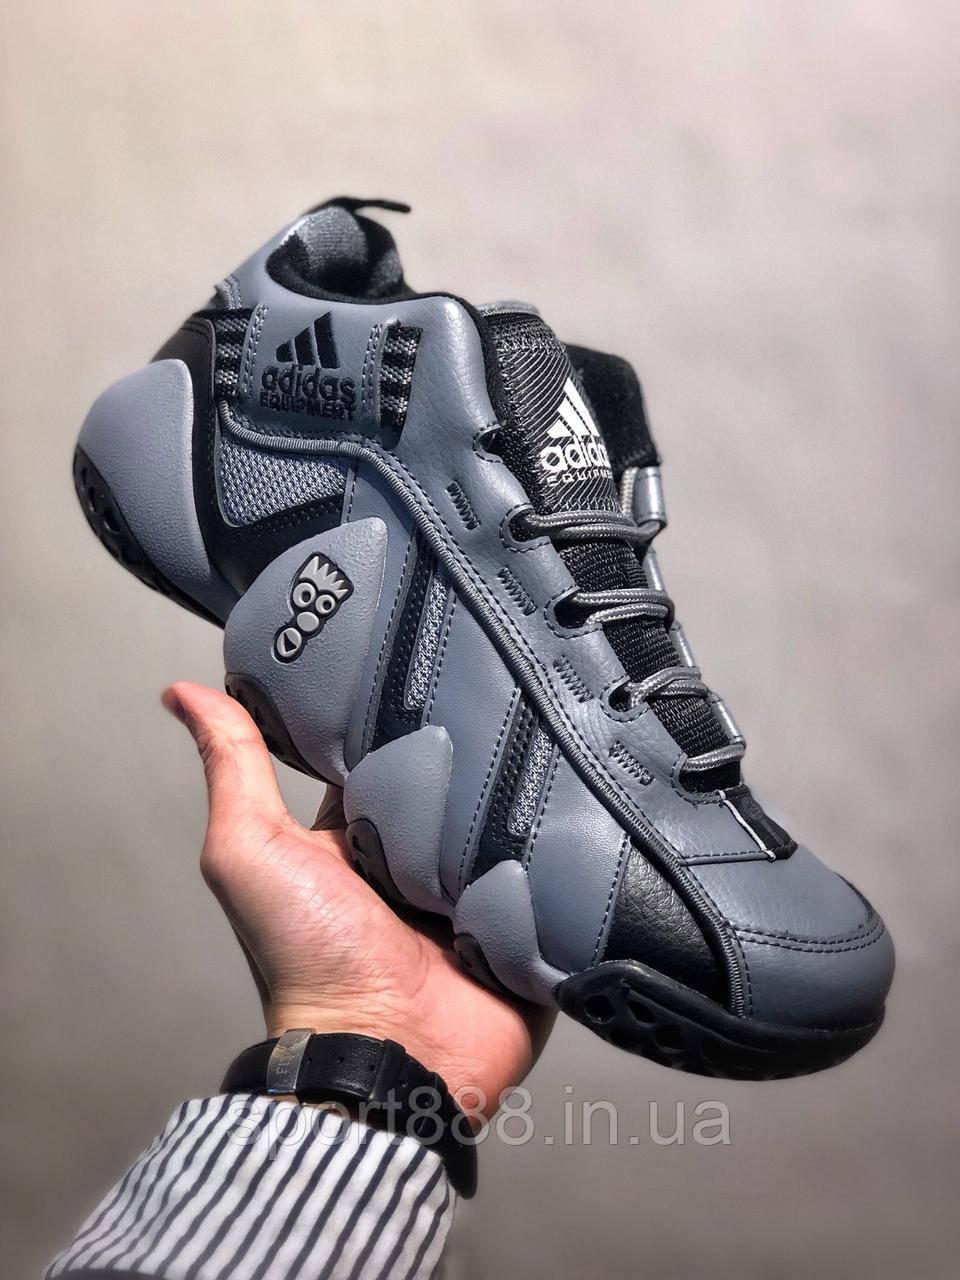 best loved be2cf 0abe3 Adidas Originals EQT Key Trainer Keyshawn Johnson мужские кроссовки